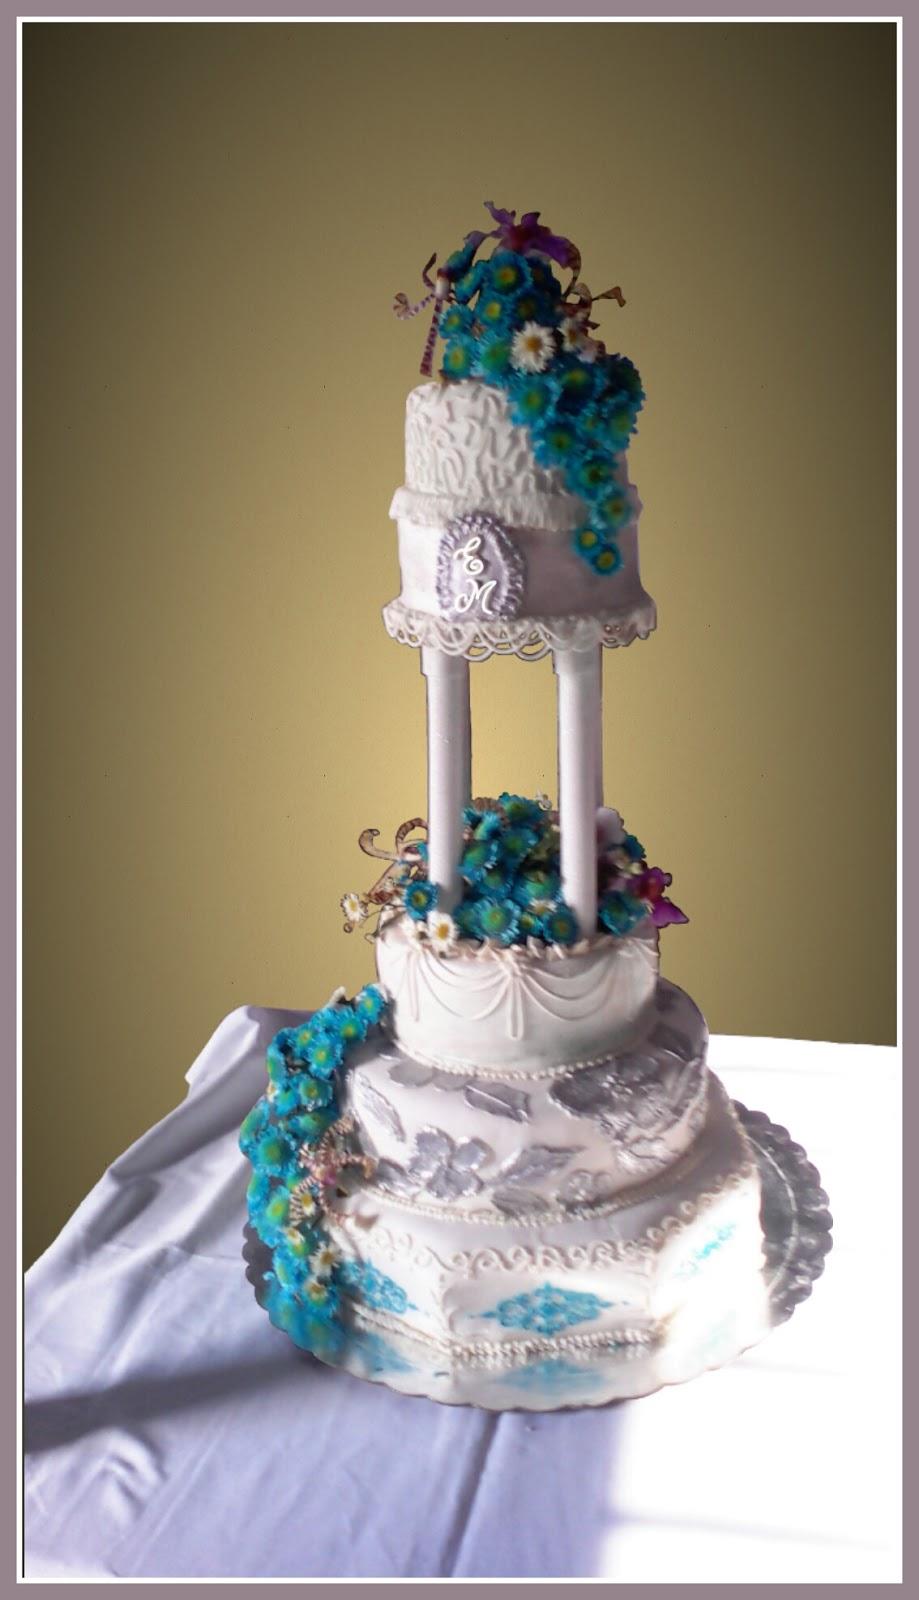 Pasteles Decorados Angel Azul - Fotos-de-pasteles-decorados